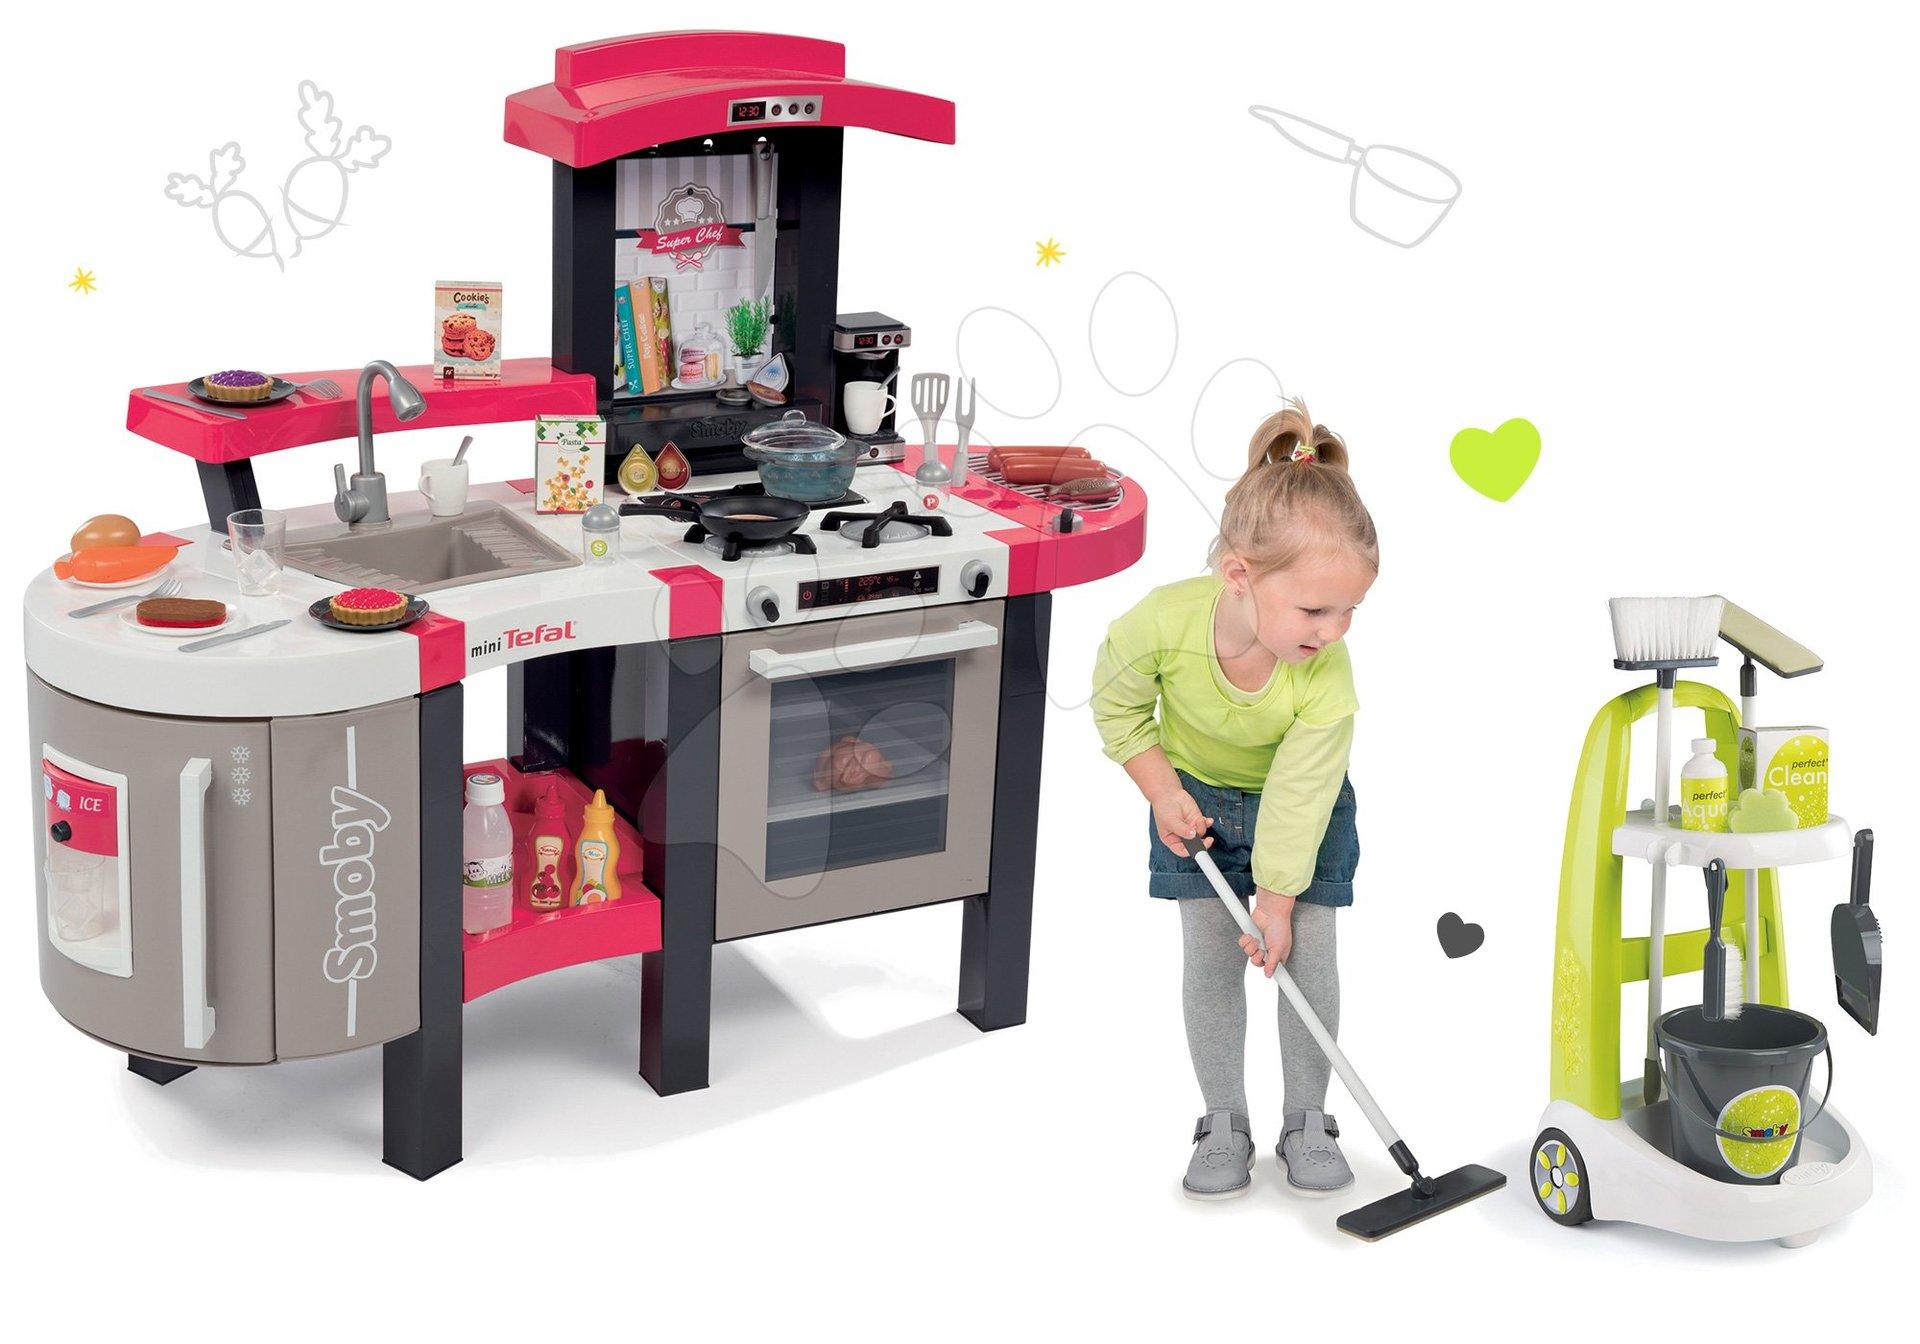 Kuchynky pre deti sety - Set kuchynka Tefal SuperChef Smoby s grilom a kávovarom a upratovací vozík Clean